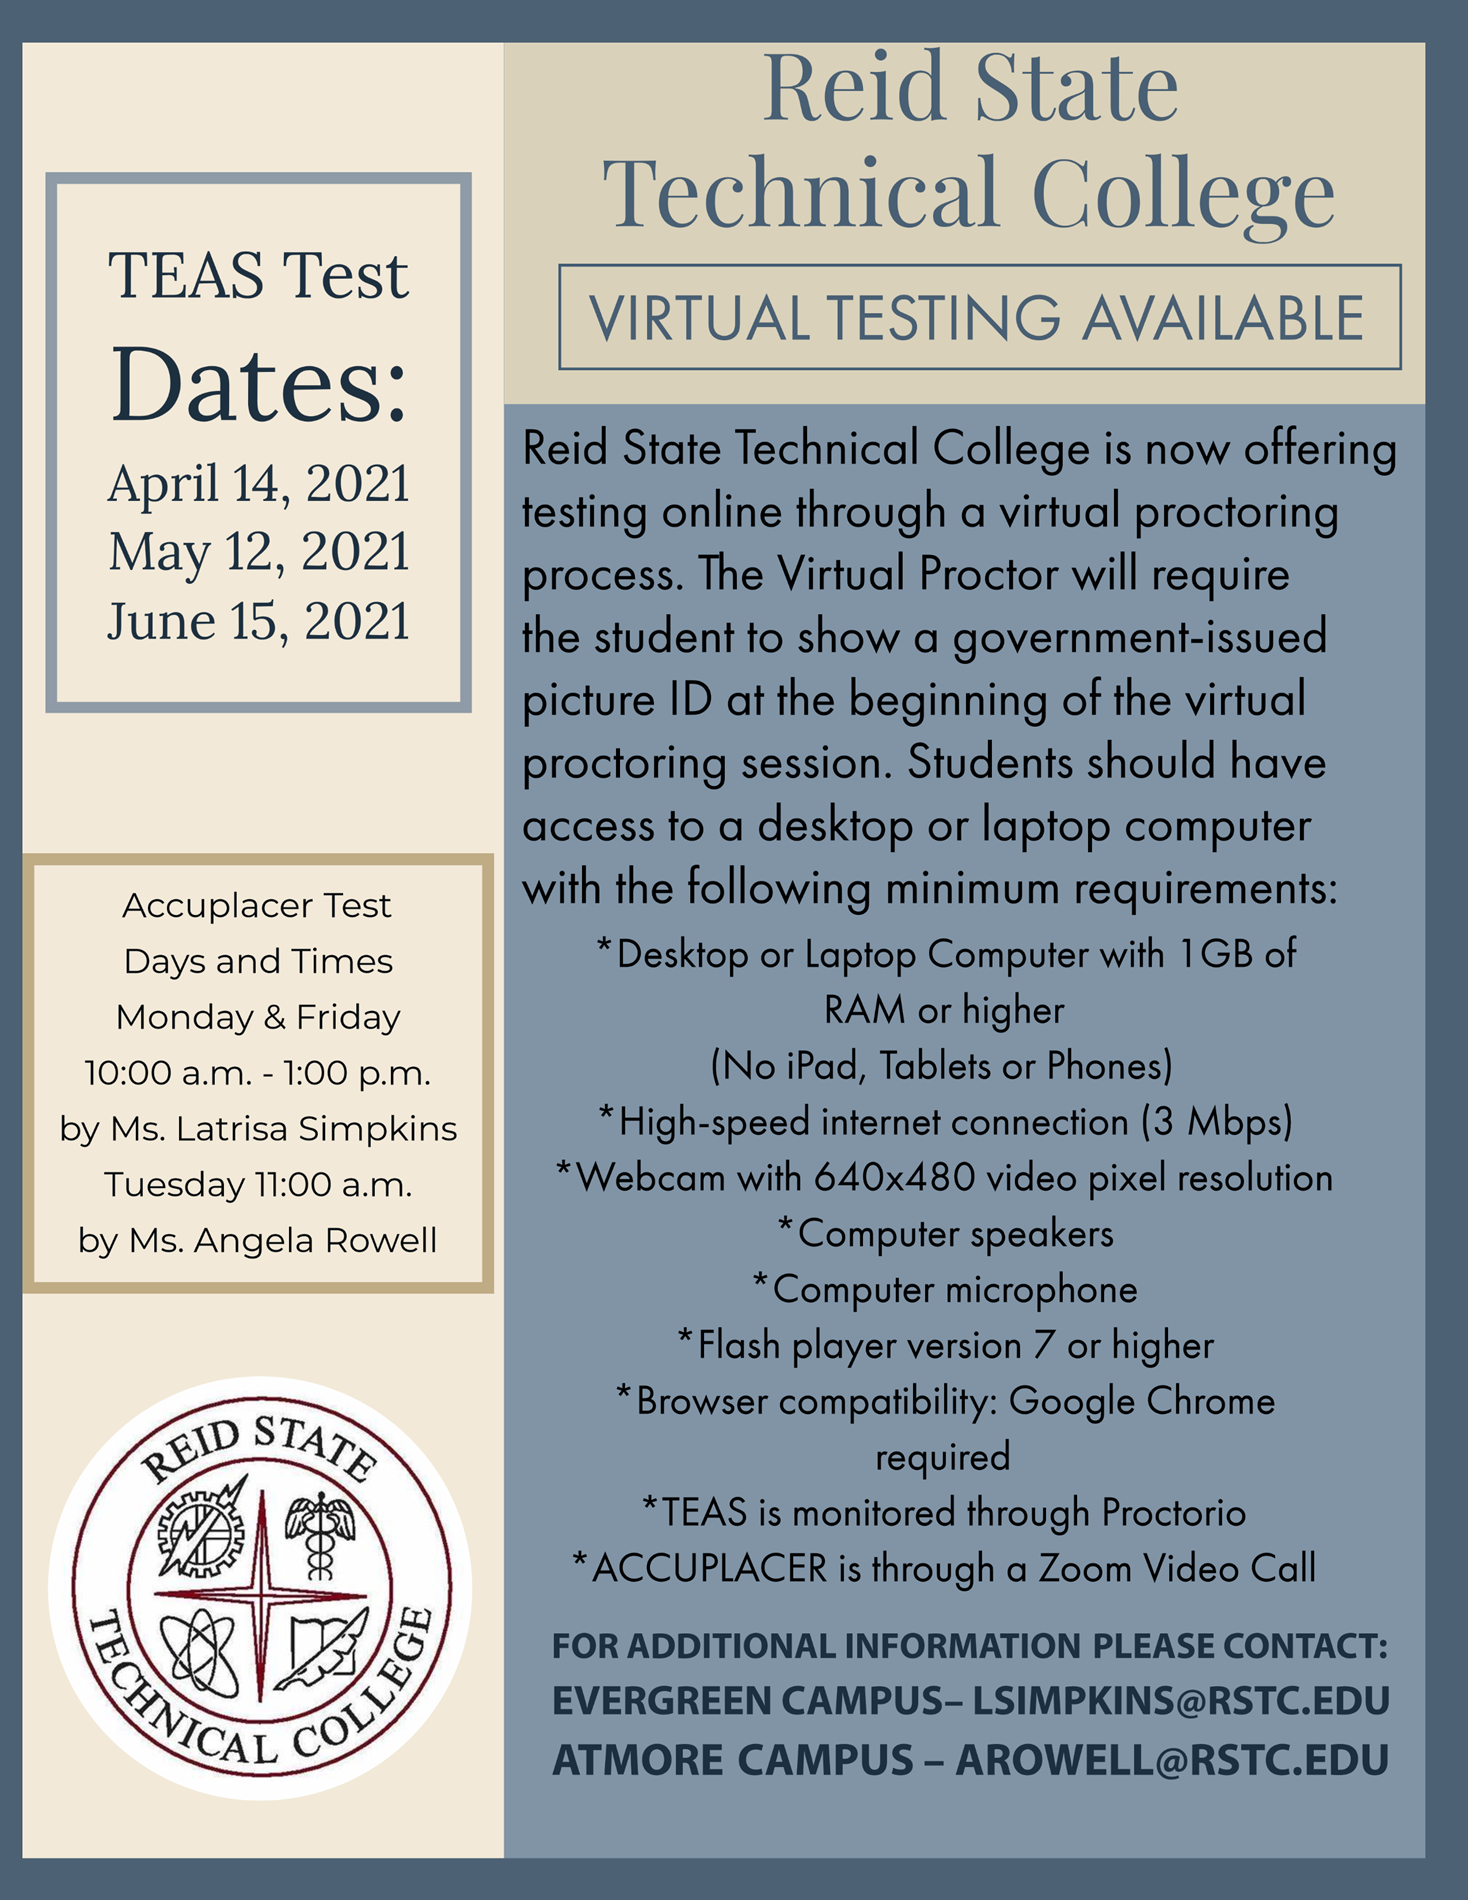 Reid State Virtual Testing Poster